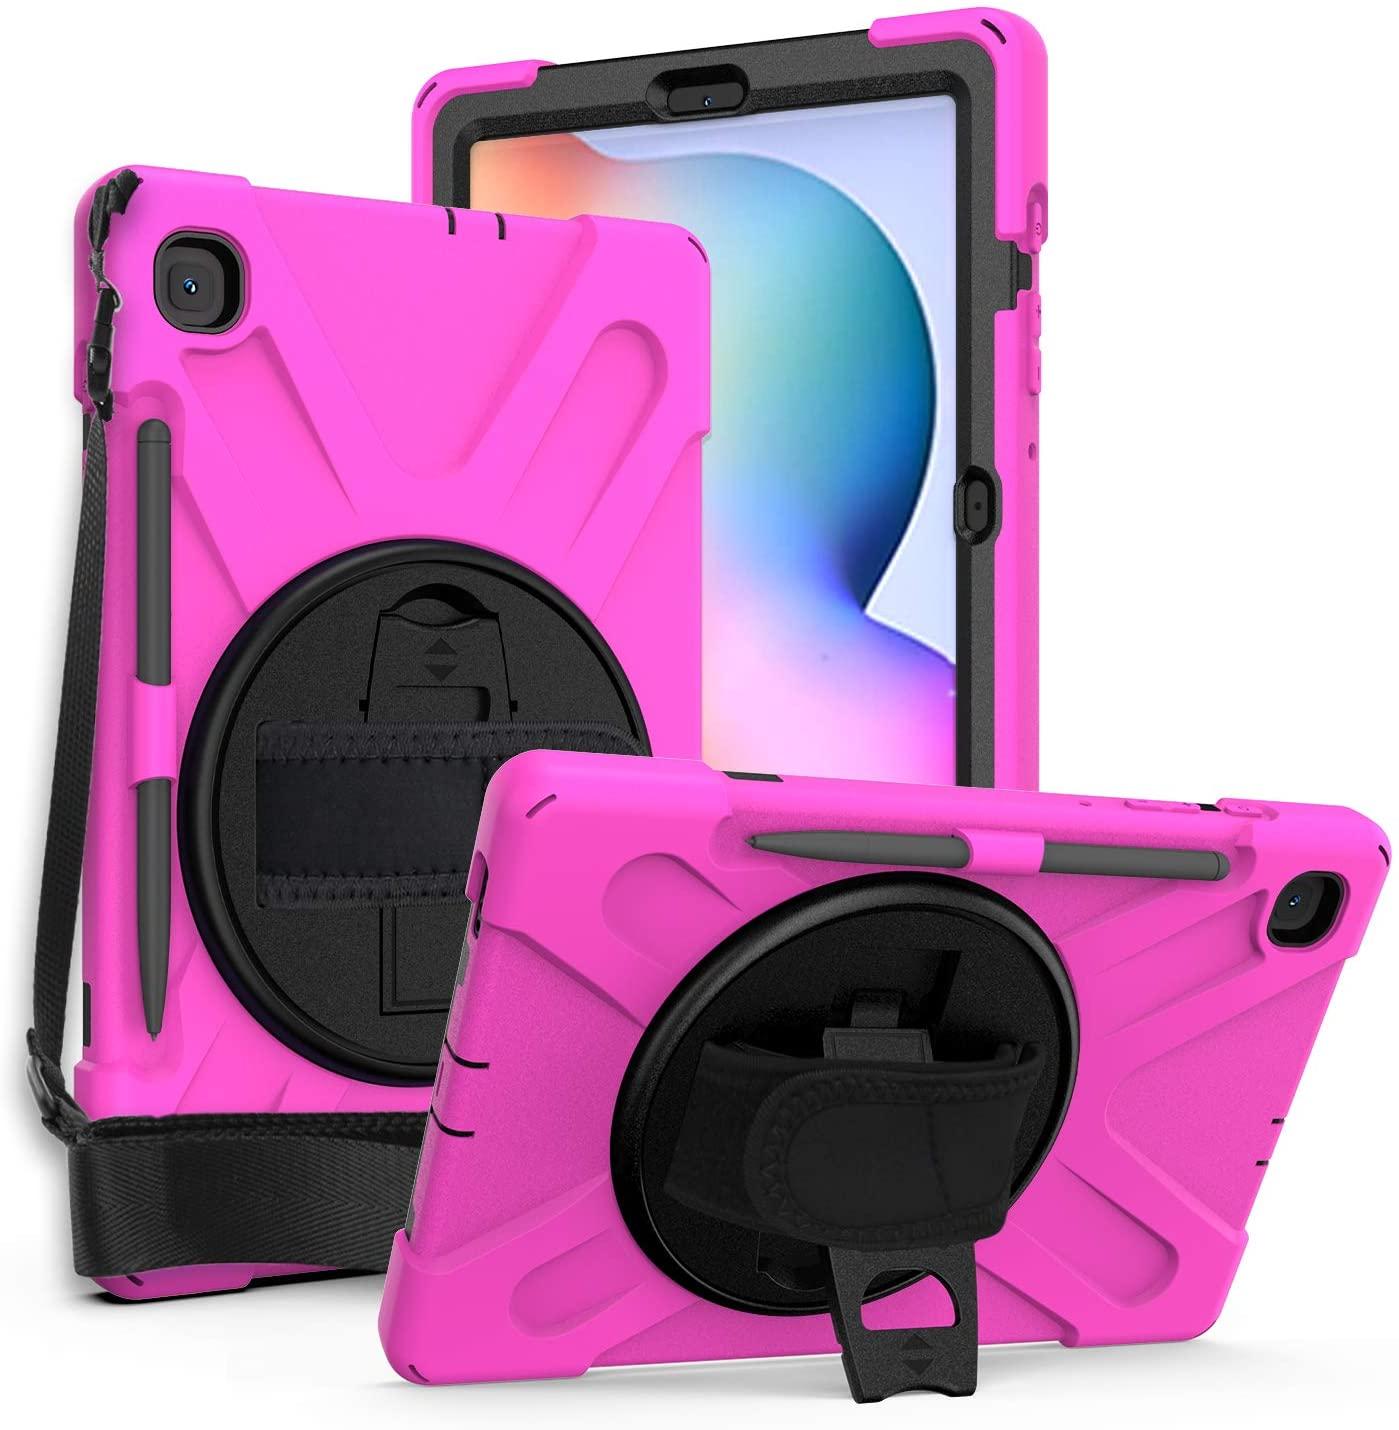 Galaxy Tab S6 Lite 10.4 2020 P610, KIQ Heavy Duty Shockproof Durable Case, Kickstand, Handstrap, Carrying Shoulderstrap Sling for Samsung Galaxy Tab S6 Lite 10.4 P610 (Shield Hot Pink)